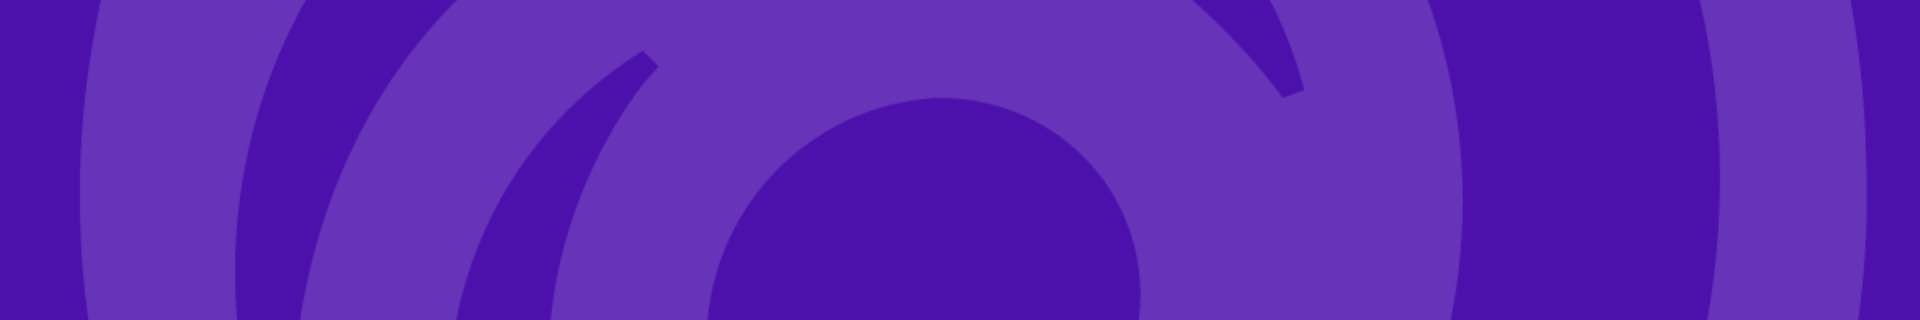 Ubisoft Entertainment - Masthead - Purple Header